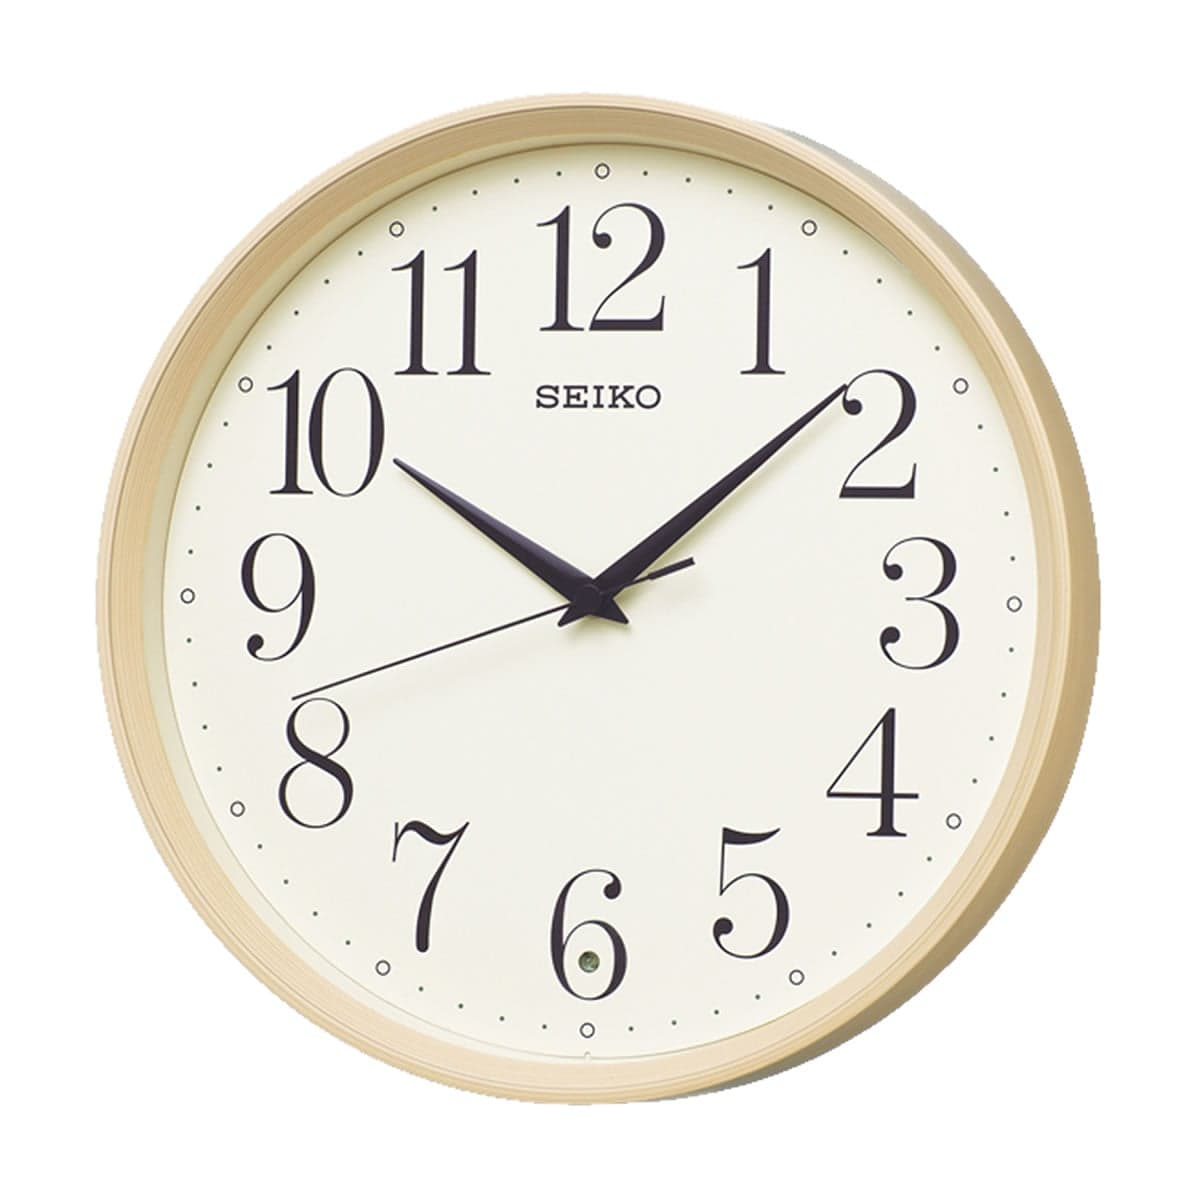 SEIKO(セイコー)スタンダード 電波掛け時計 KX222A 薄茶